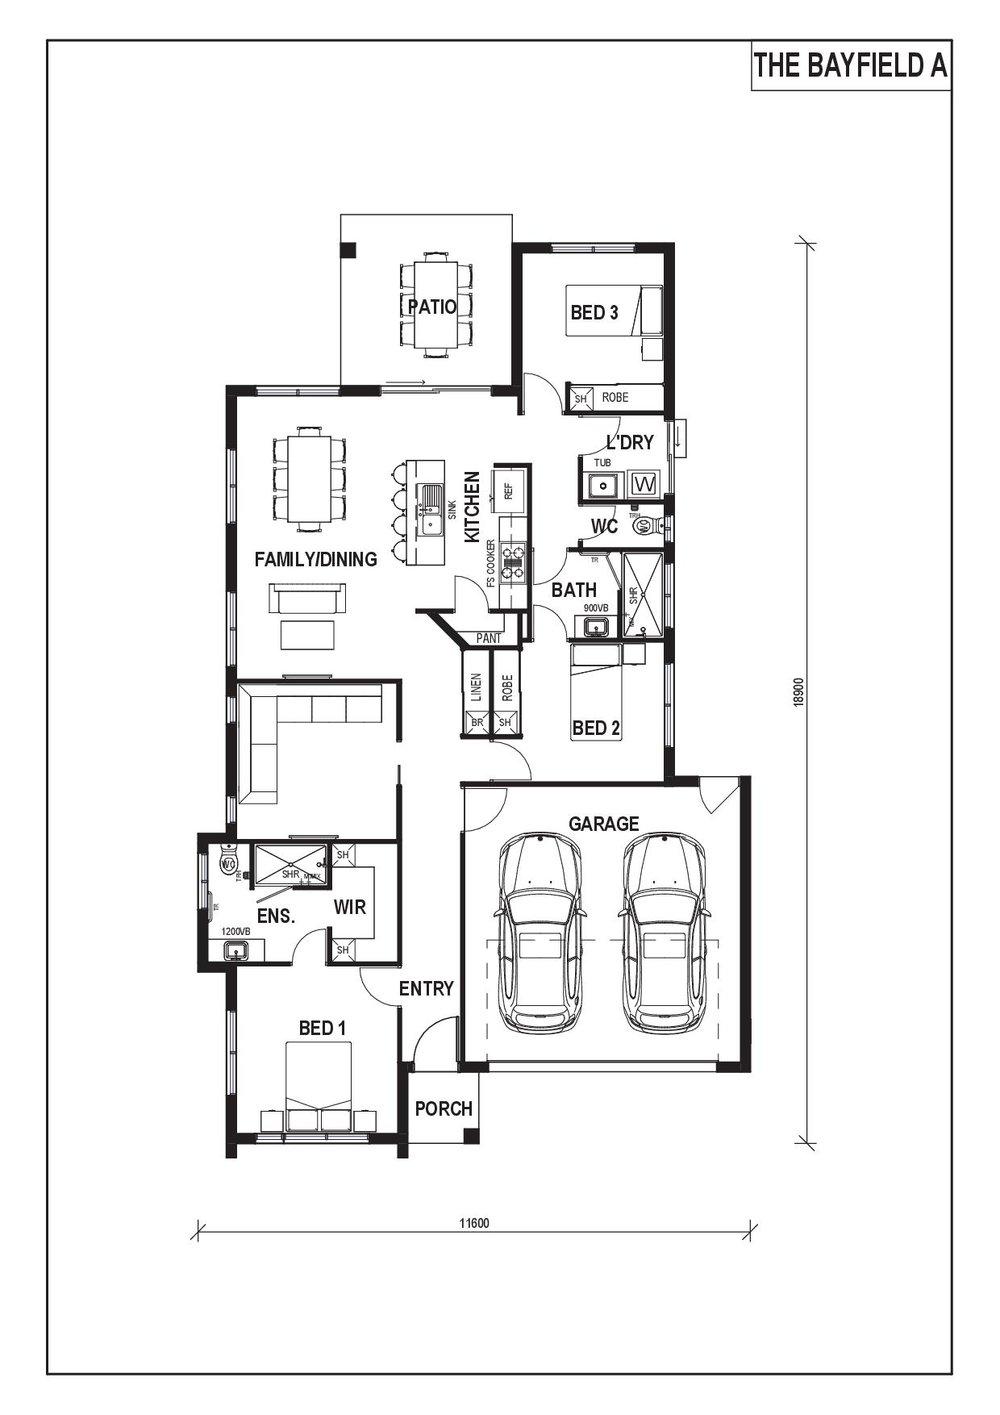 BAYFIELD A - Floor Plan.jpg